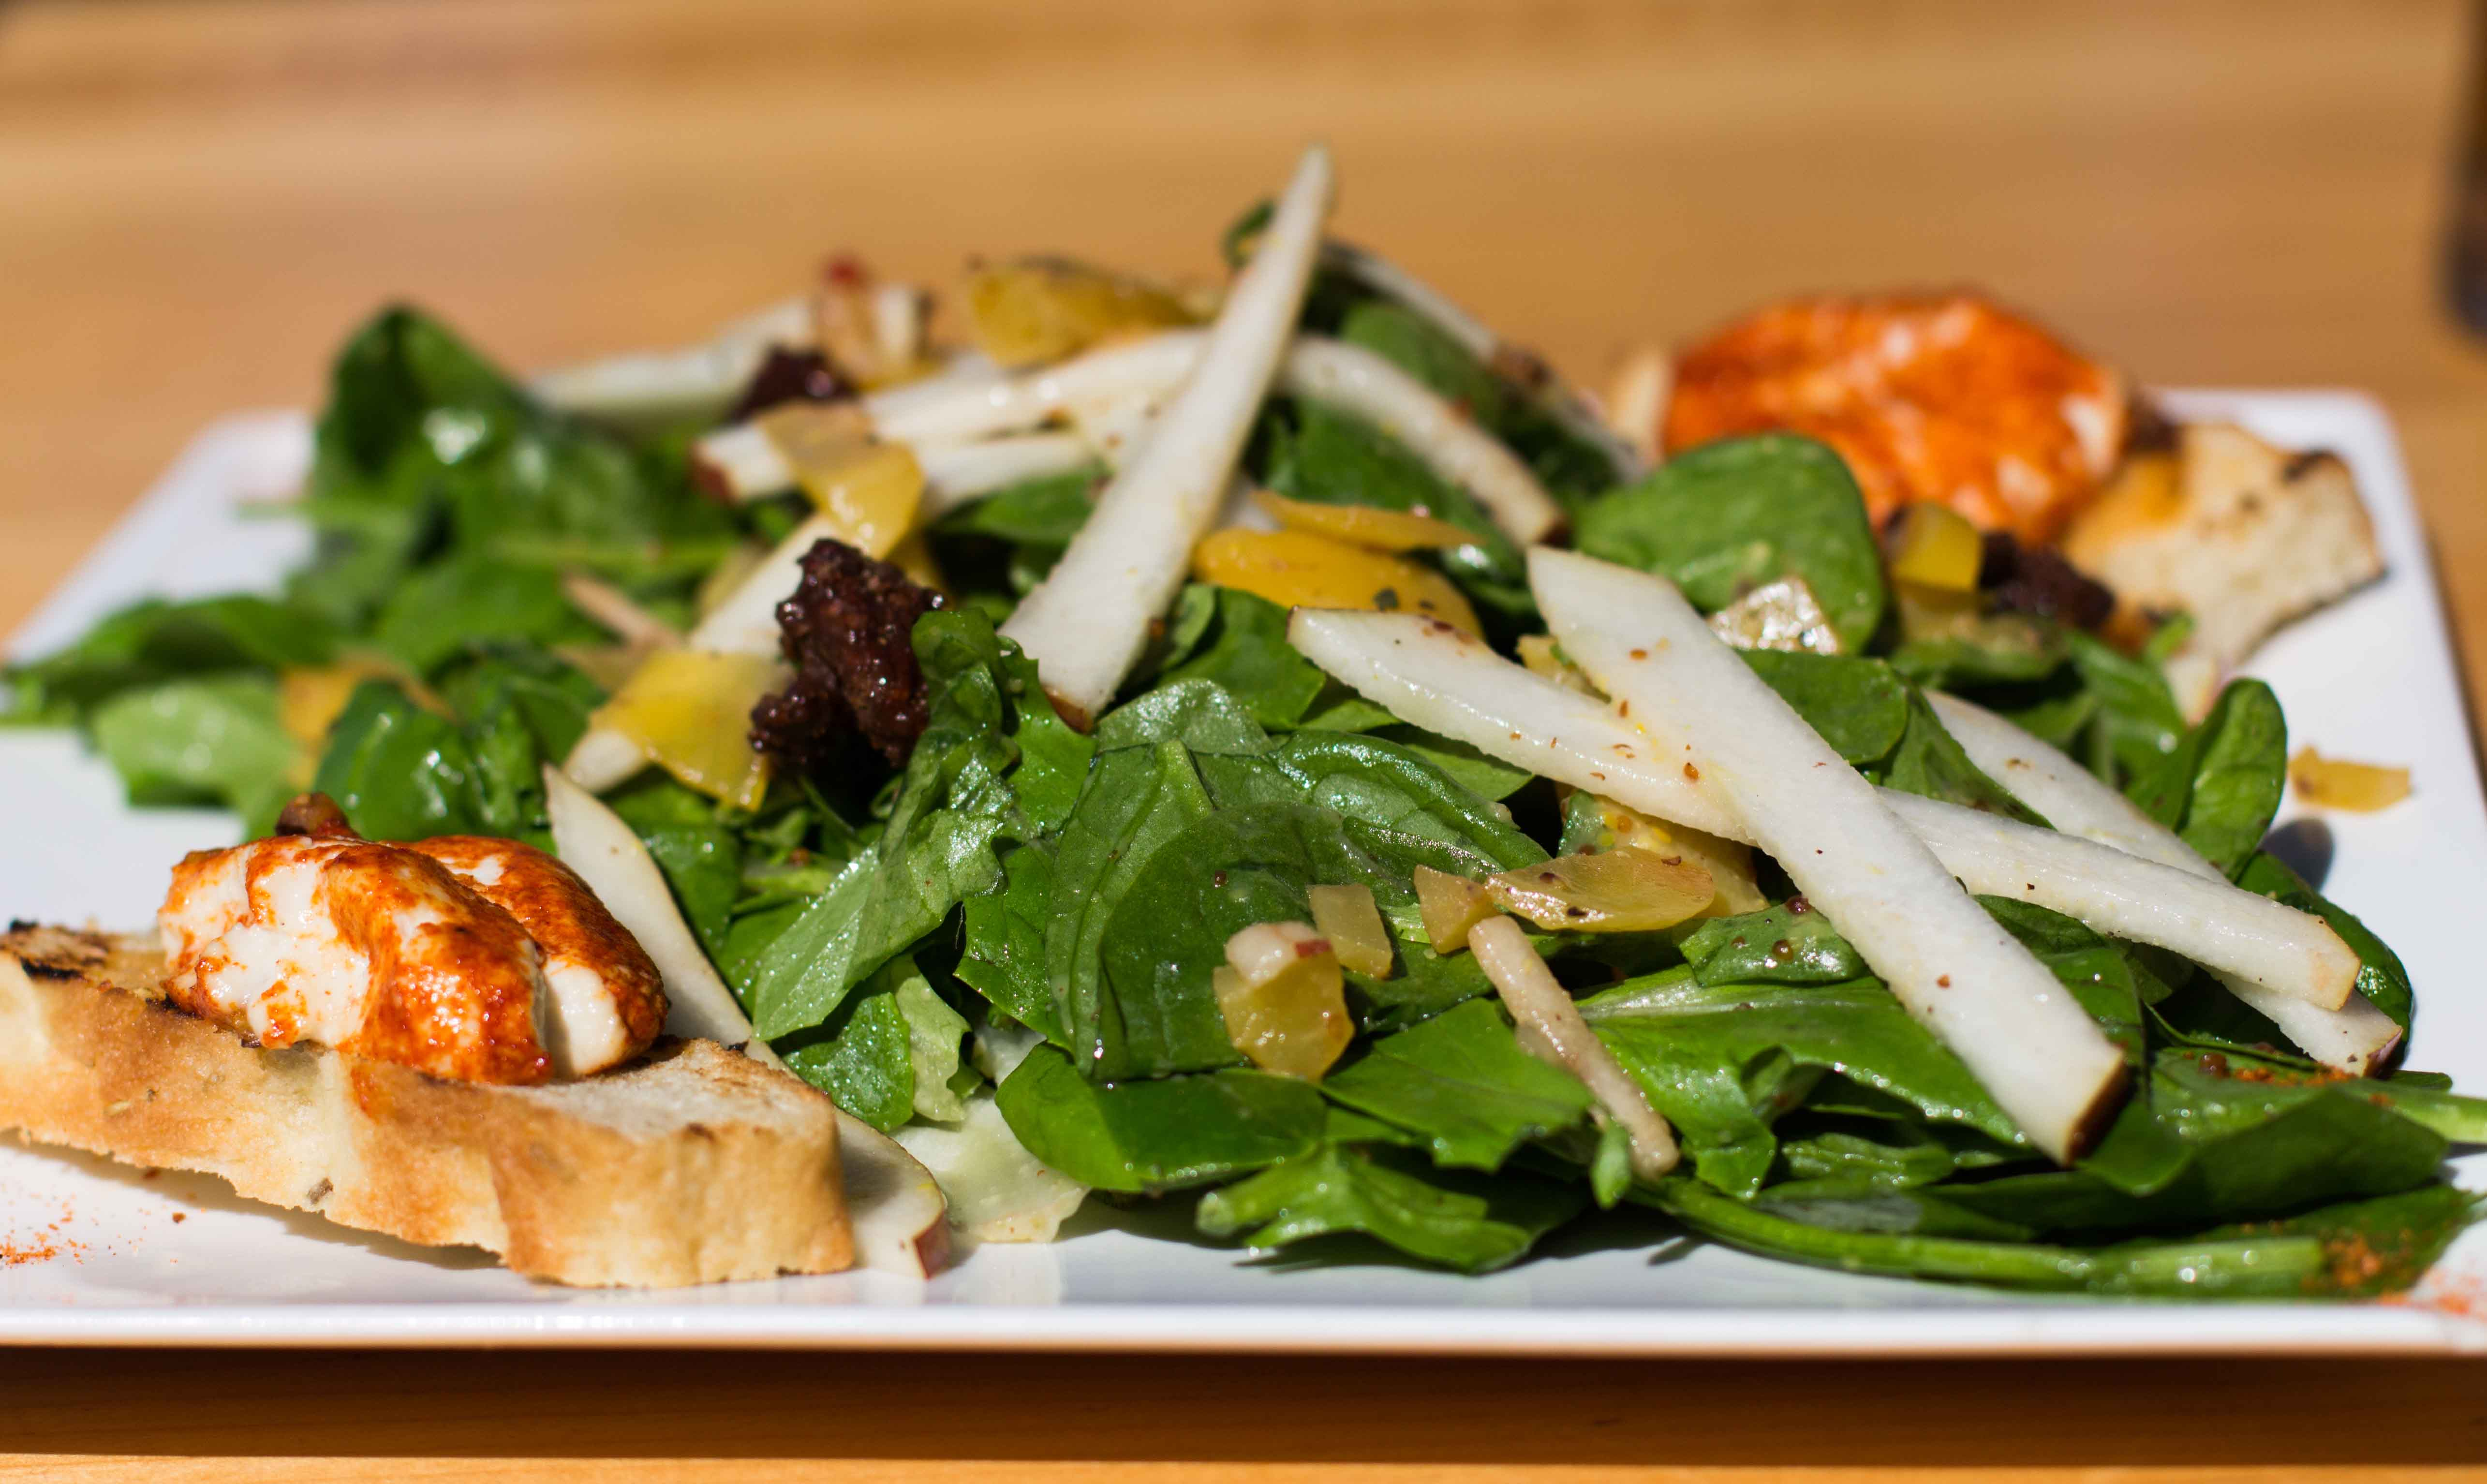 Goat cheese salad with arugula, spinach, mixed greens, Okanagan apple ...